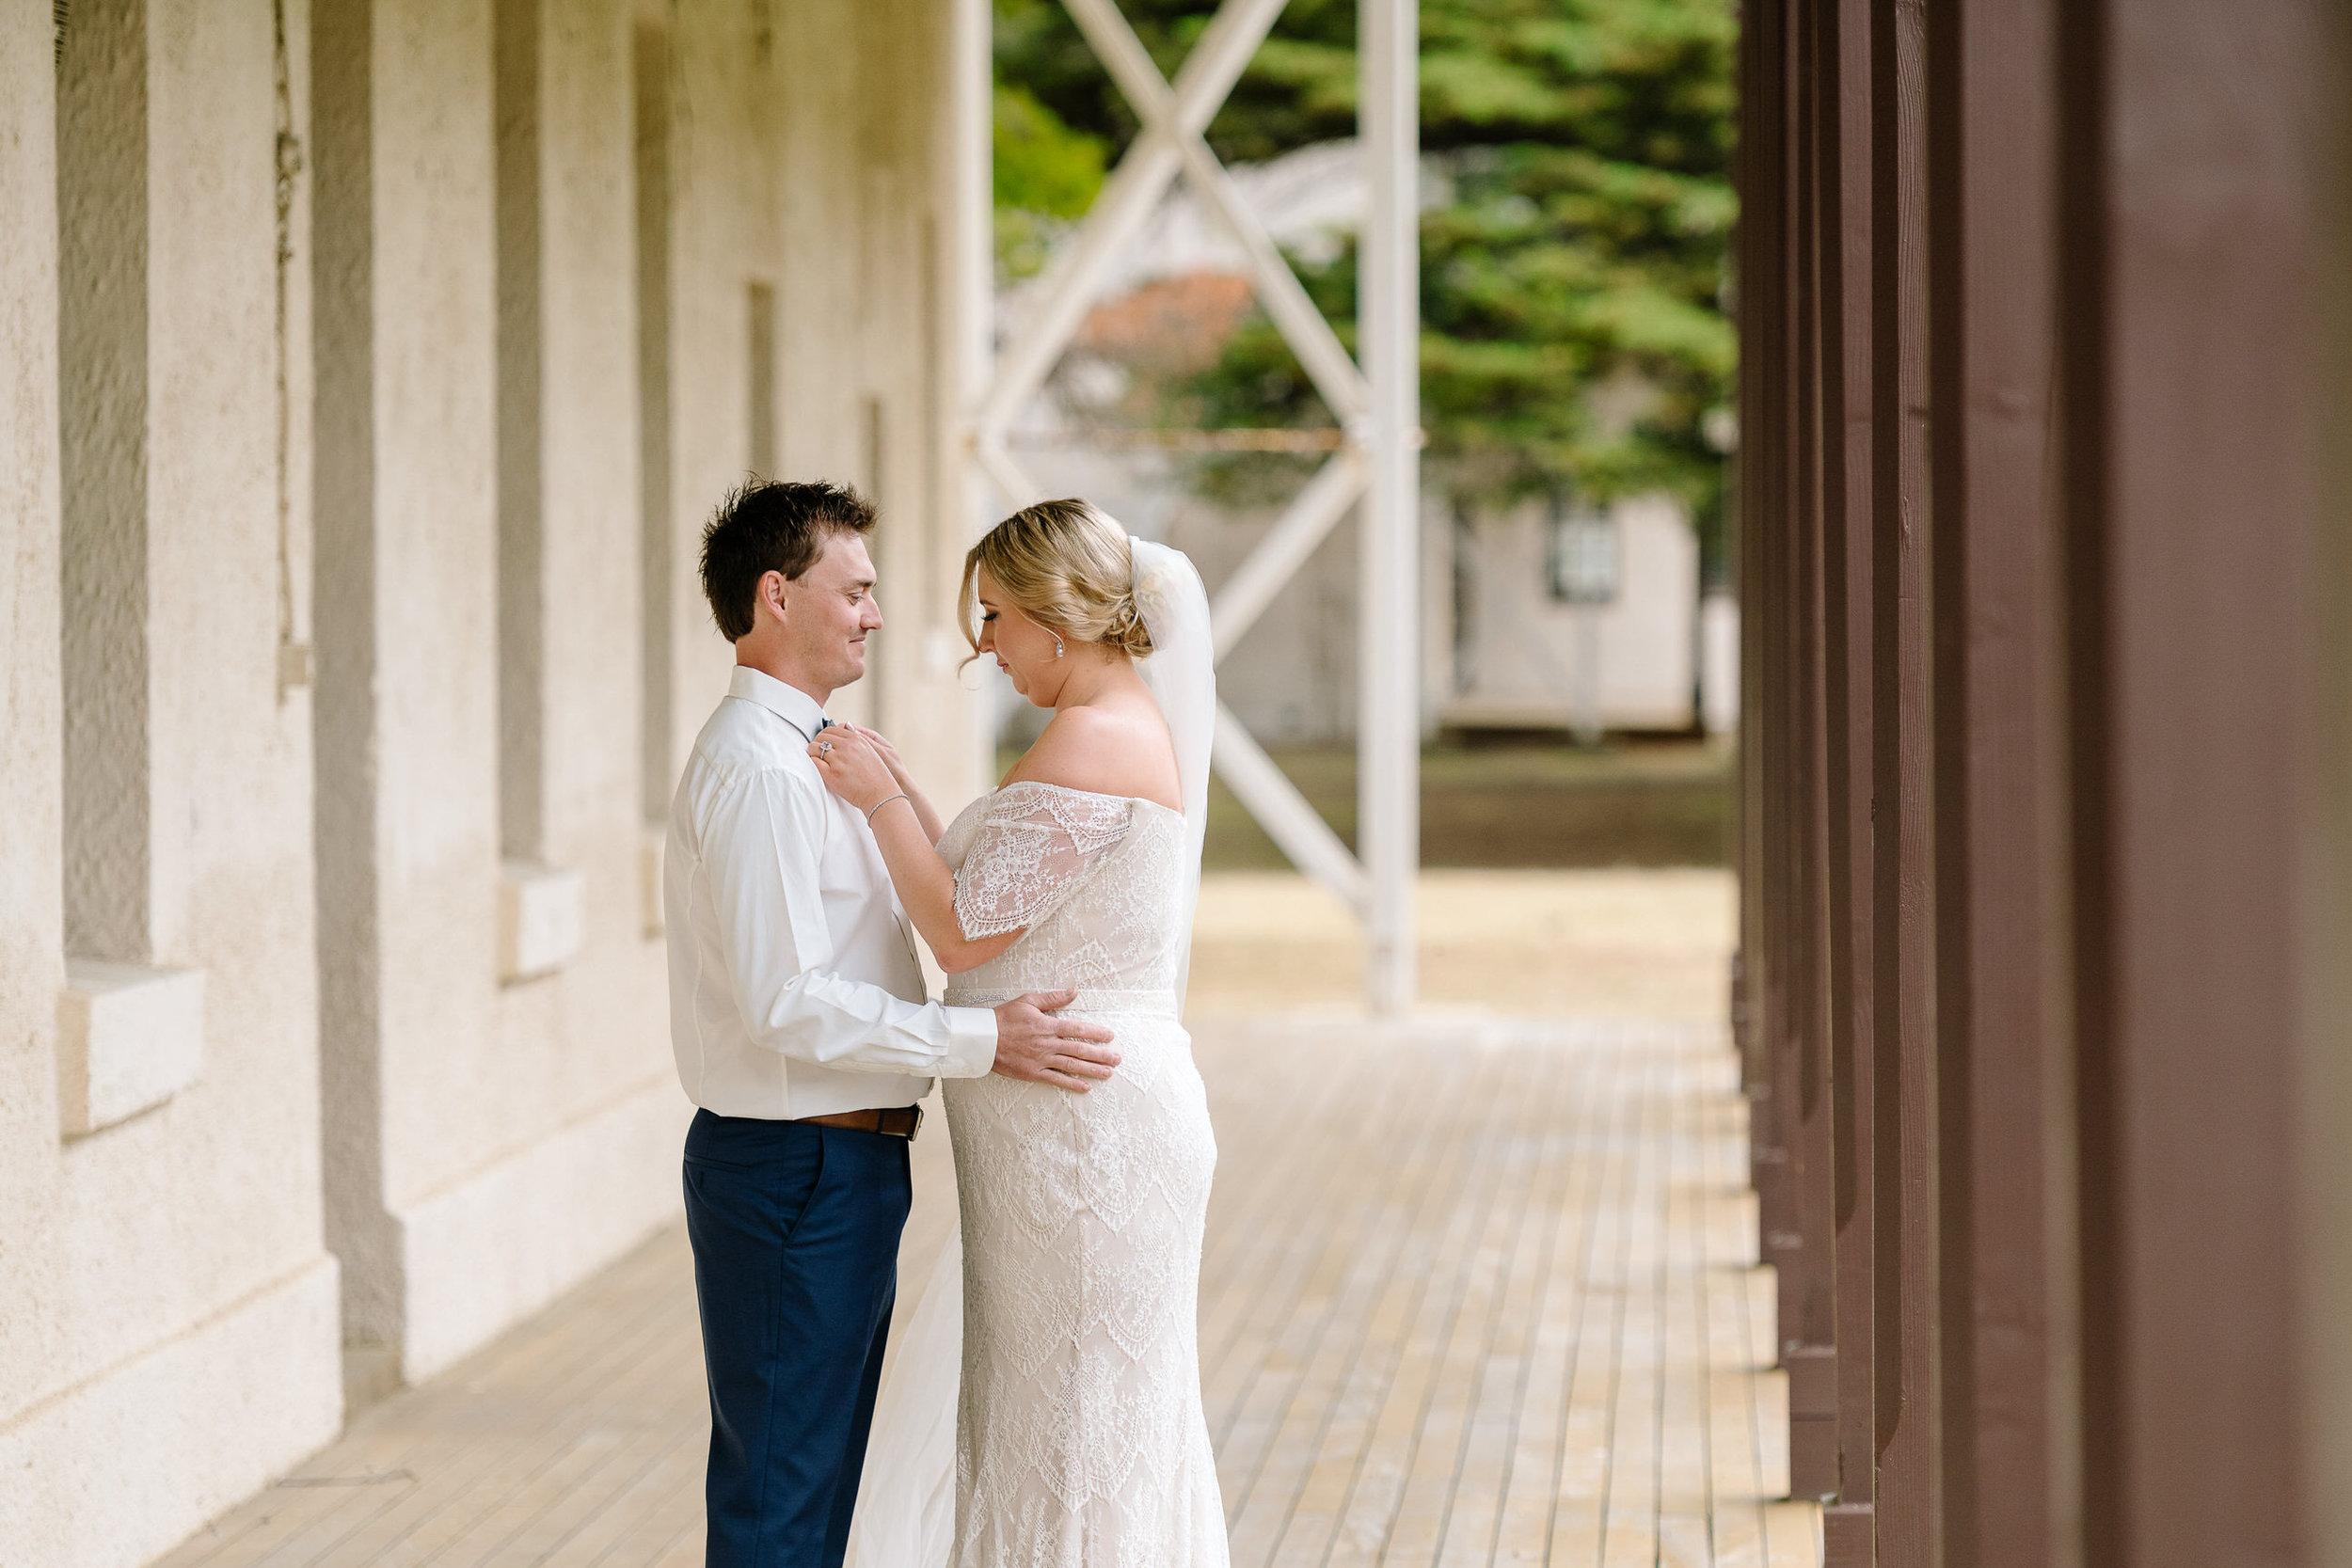 Justin_And_Jim_Photography_Portsea_Pub_Wedding48.JPG